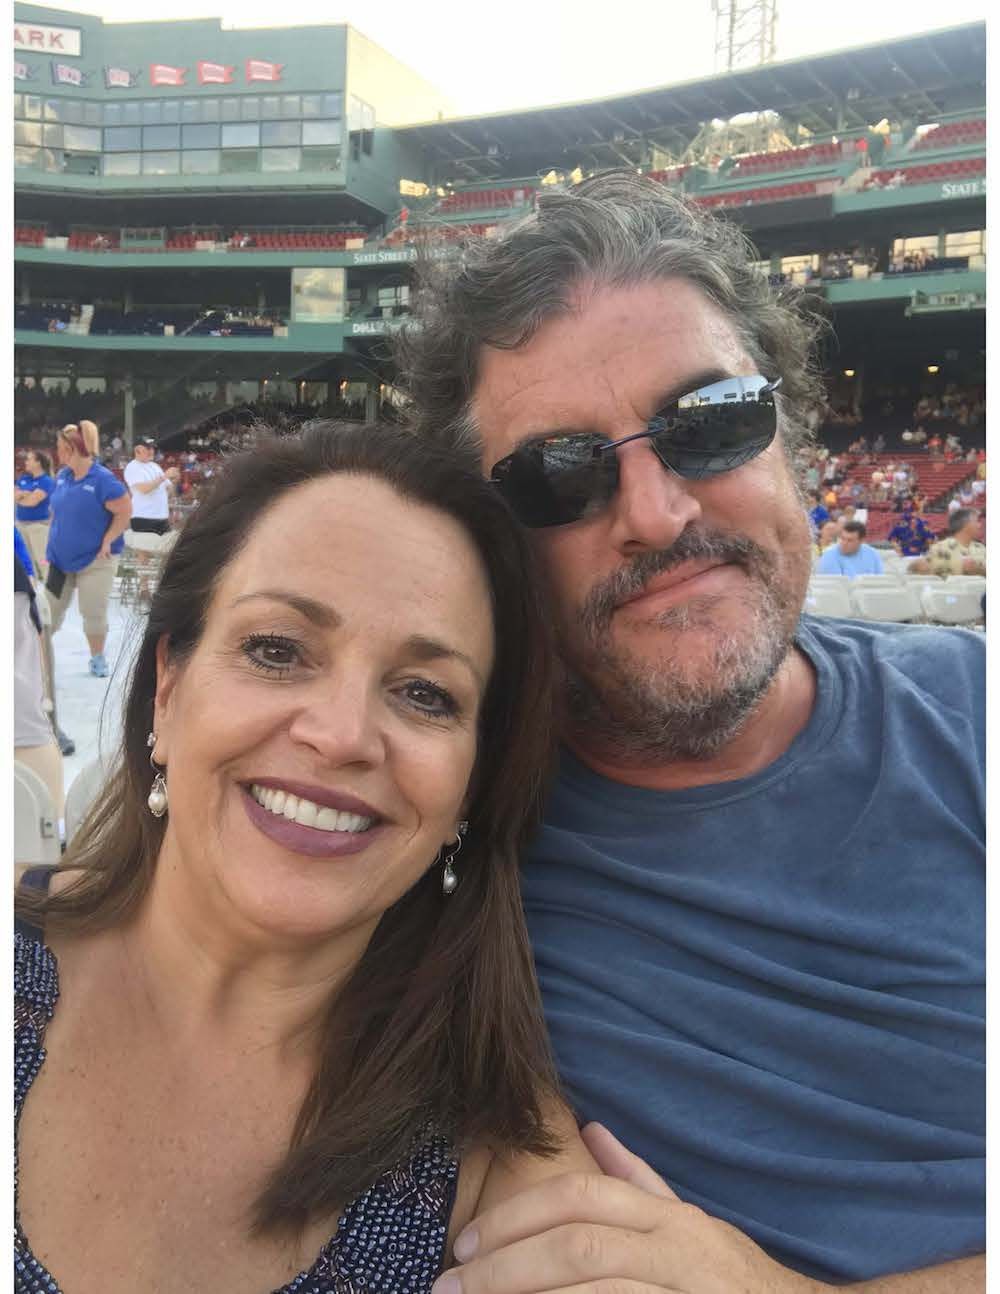 Tina and her husband at Fenway Park